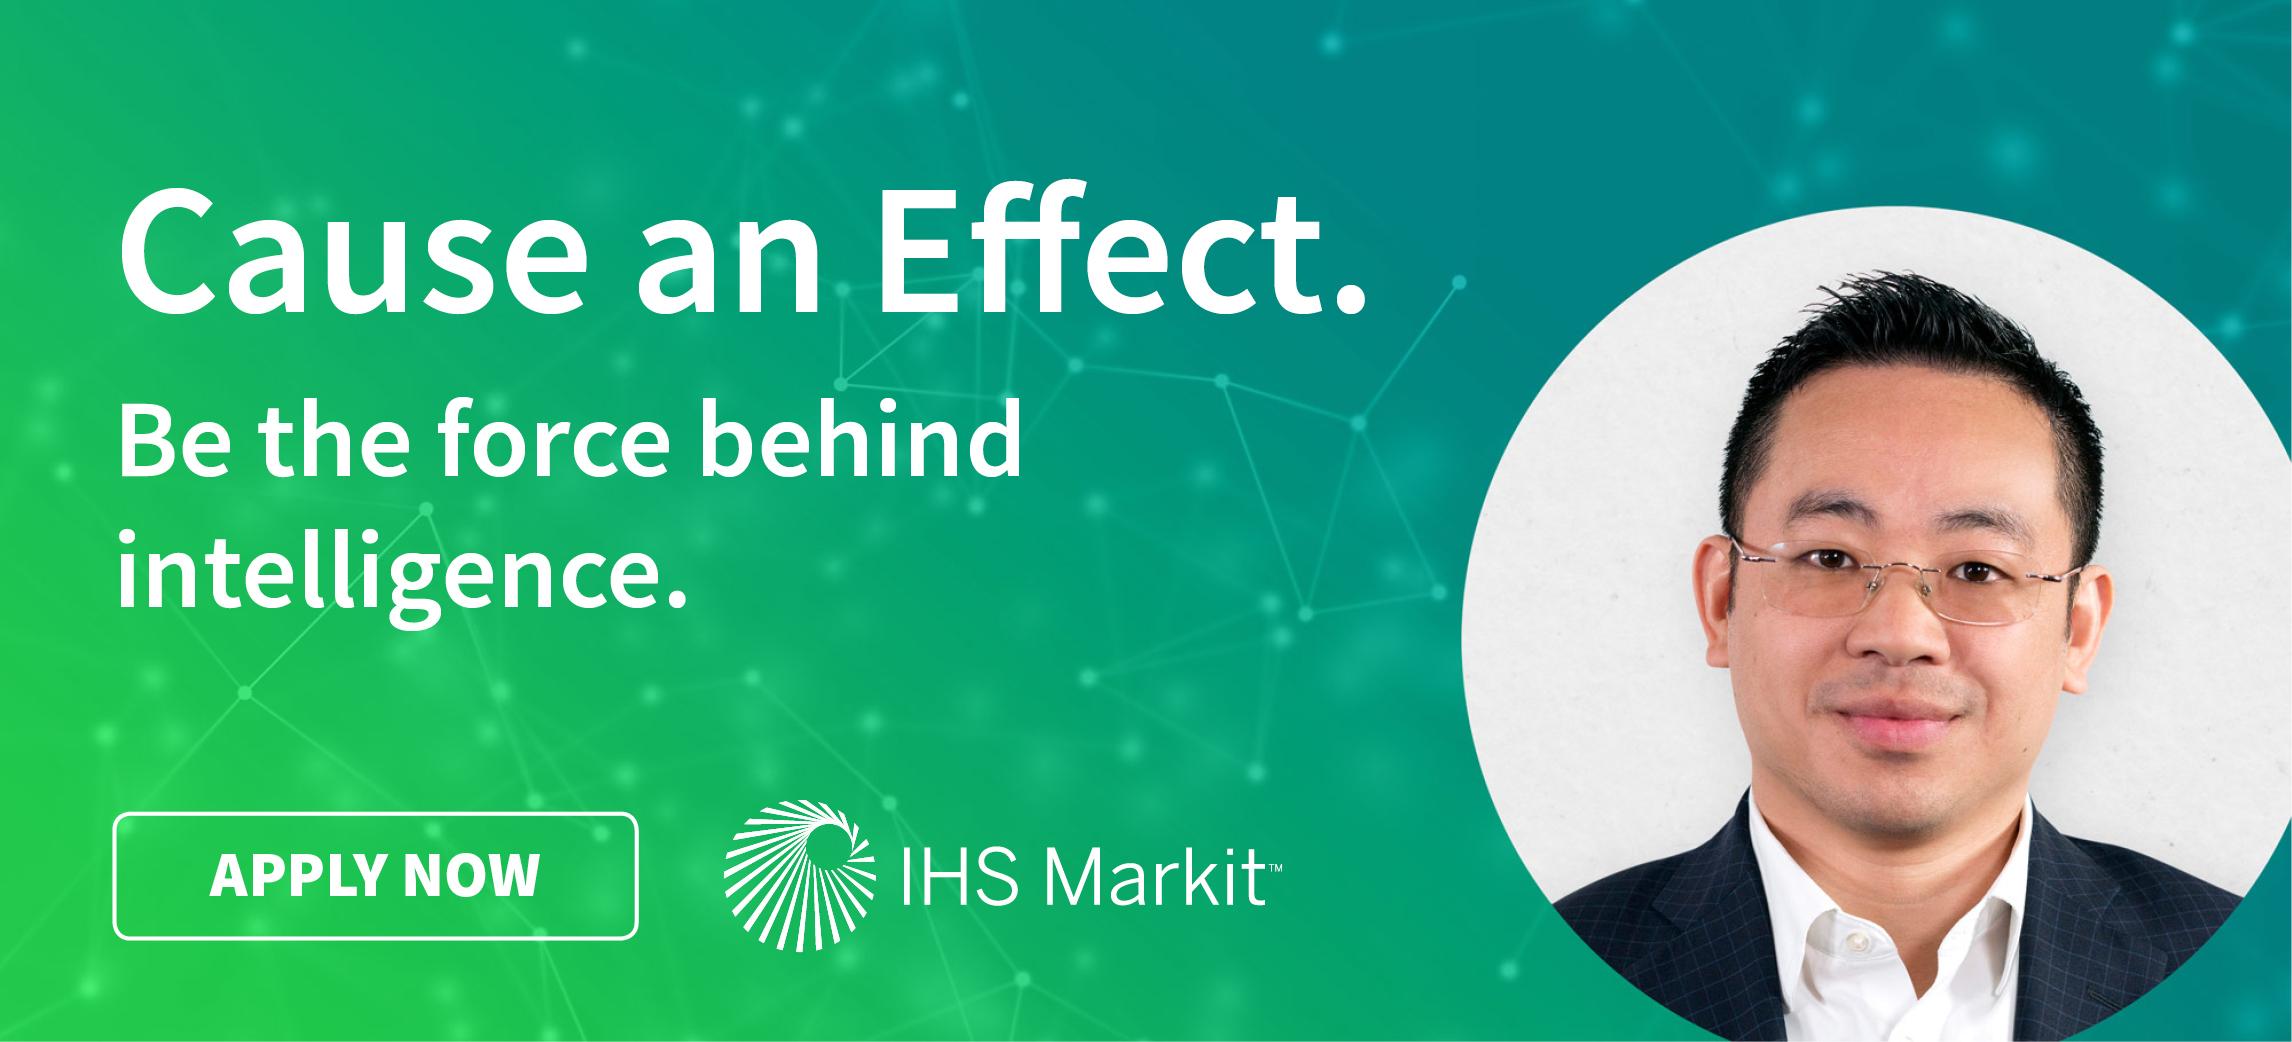 IHS Markit Cause an Effect - Digital Ad1 R15.jpg